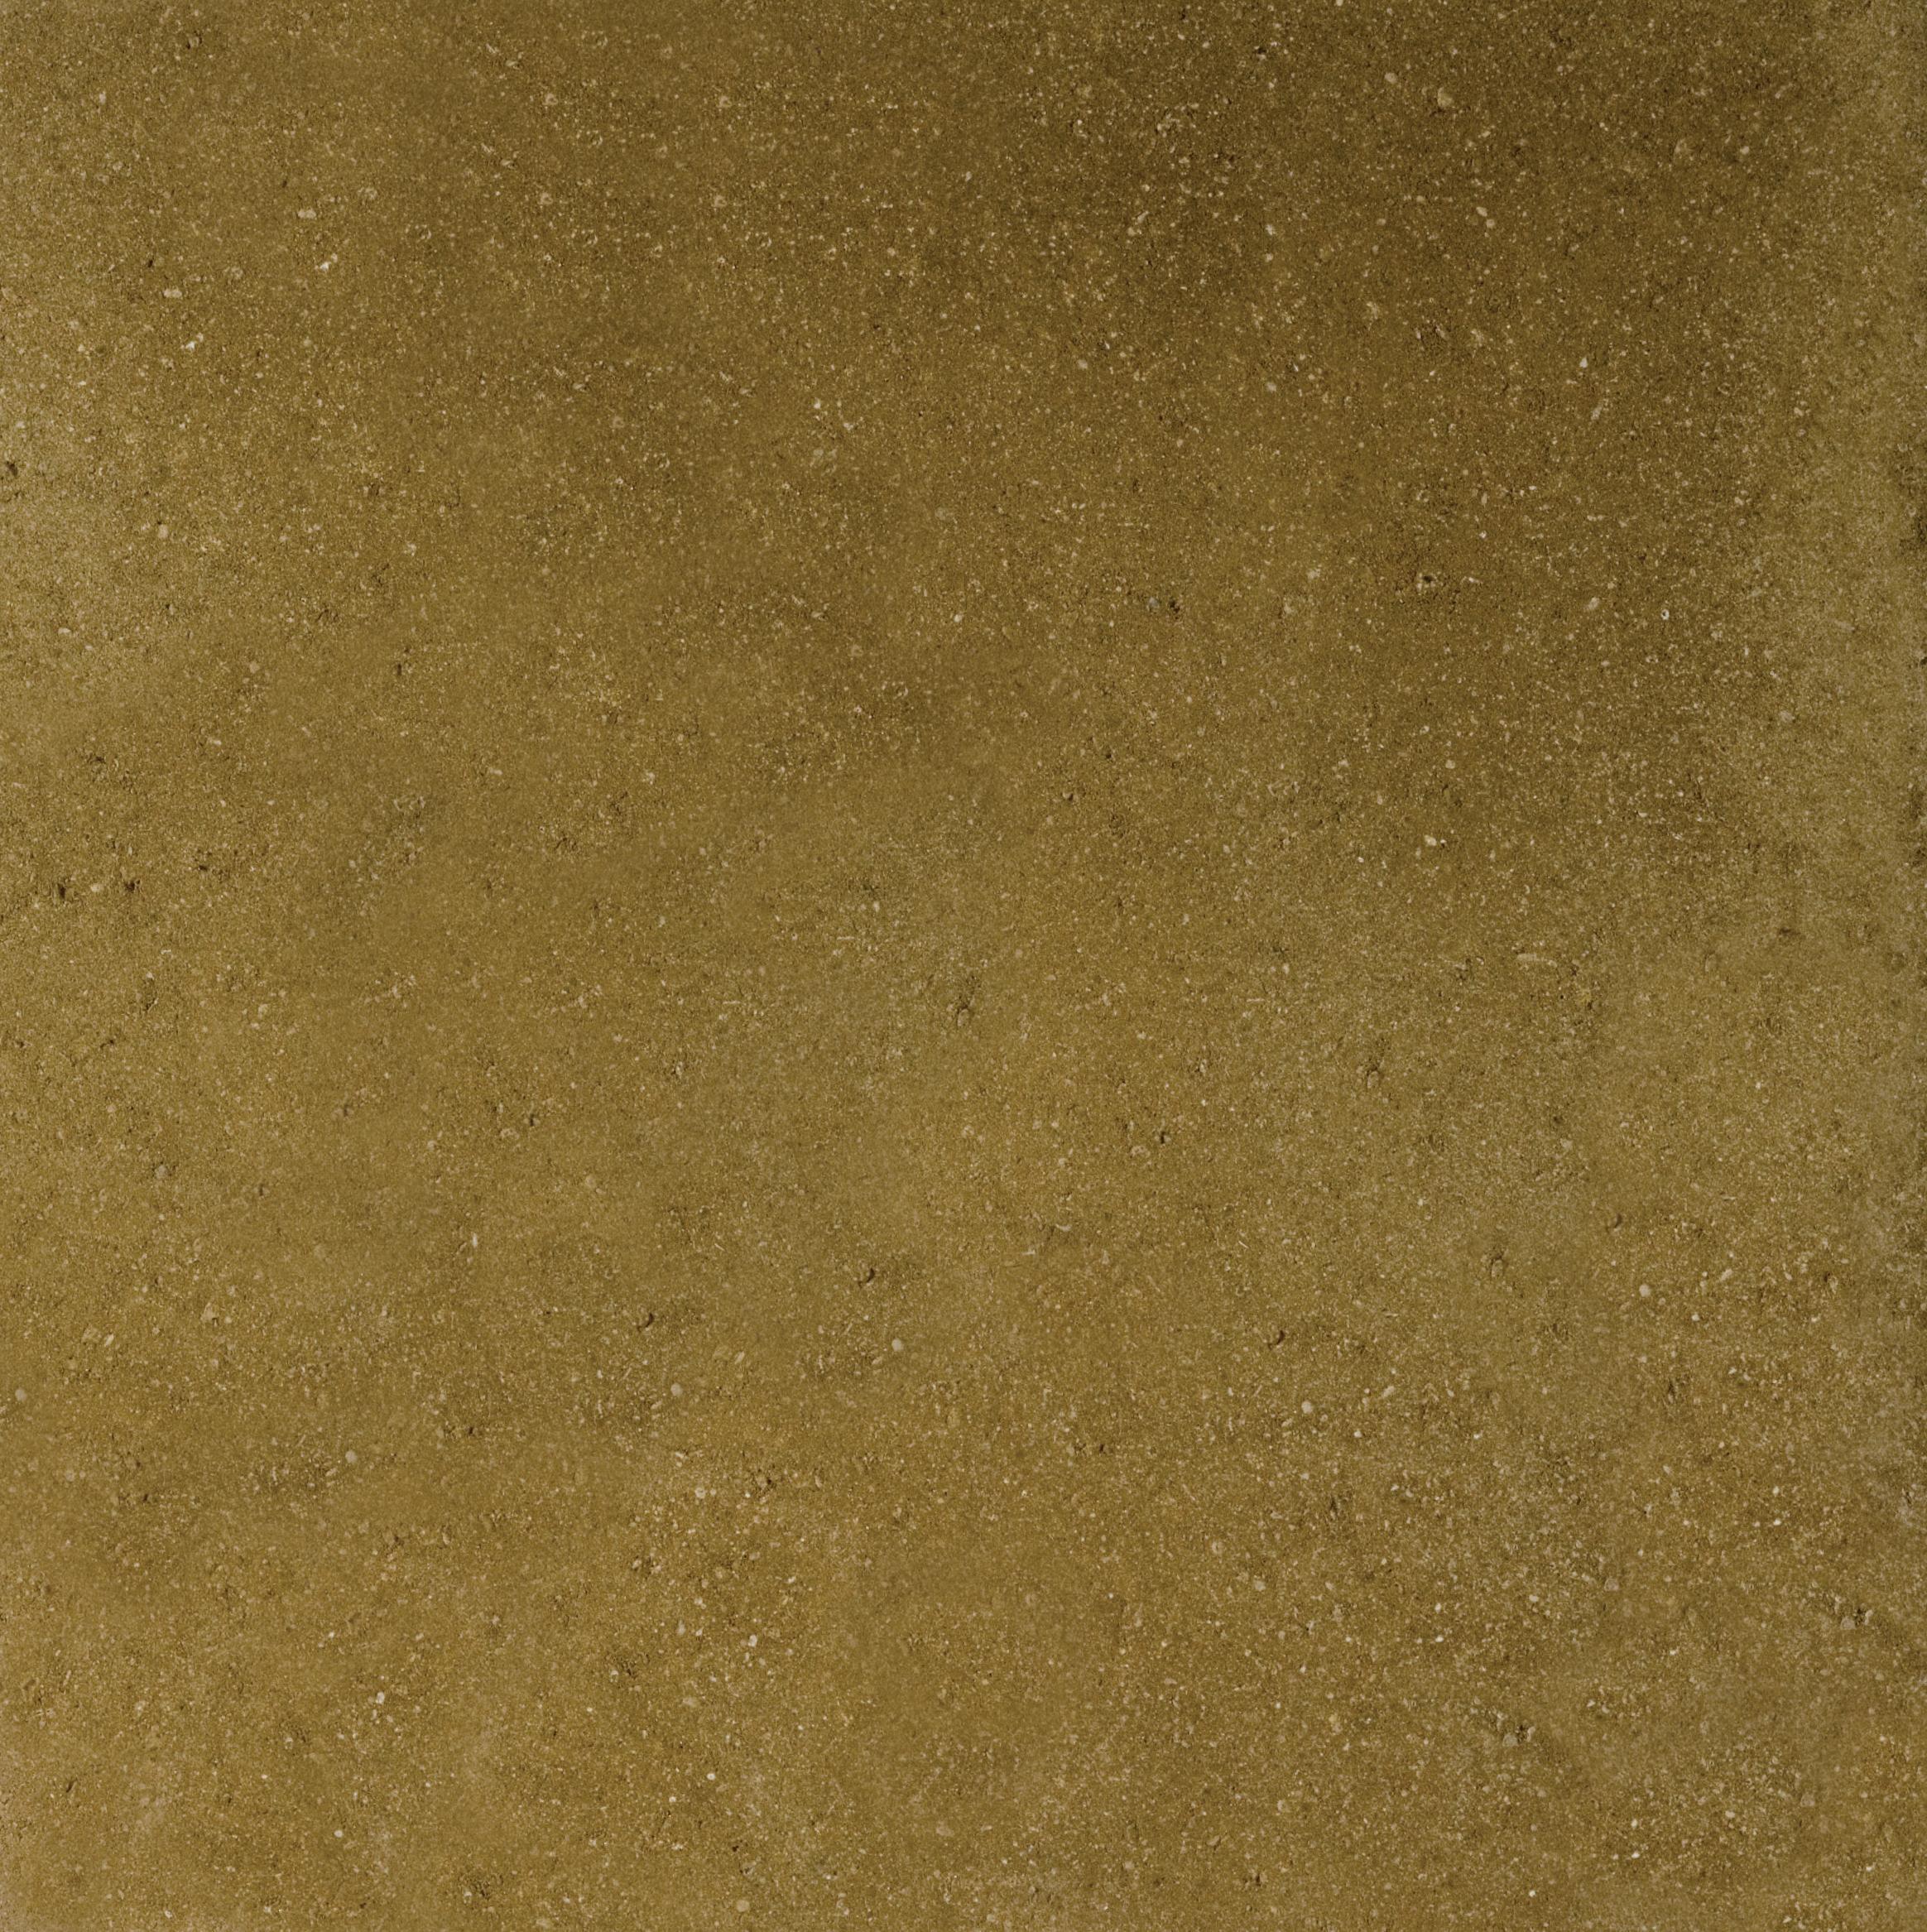 Pedra Paving Flag Smooth Sandstone 400x400x40mm (Bevel Edge)